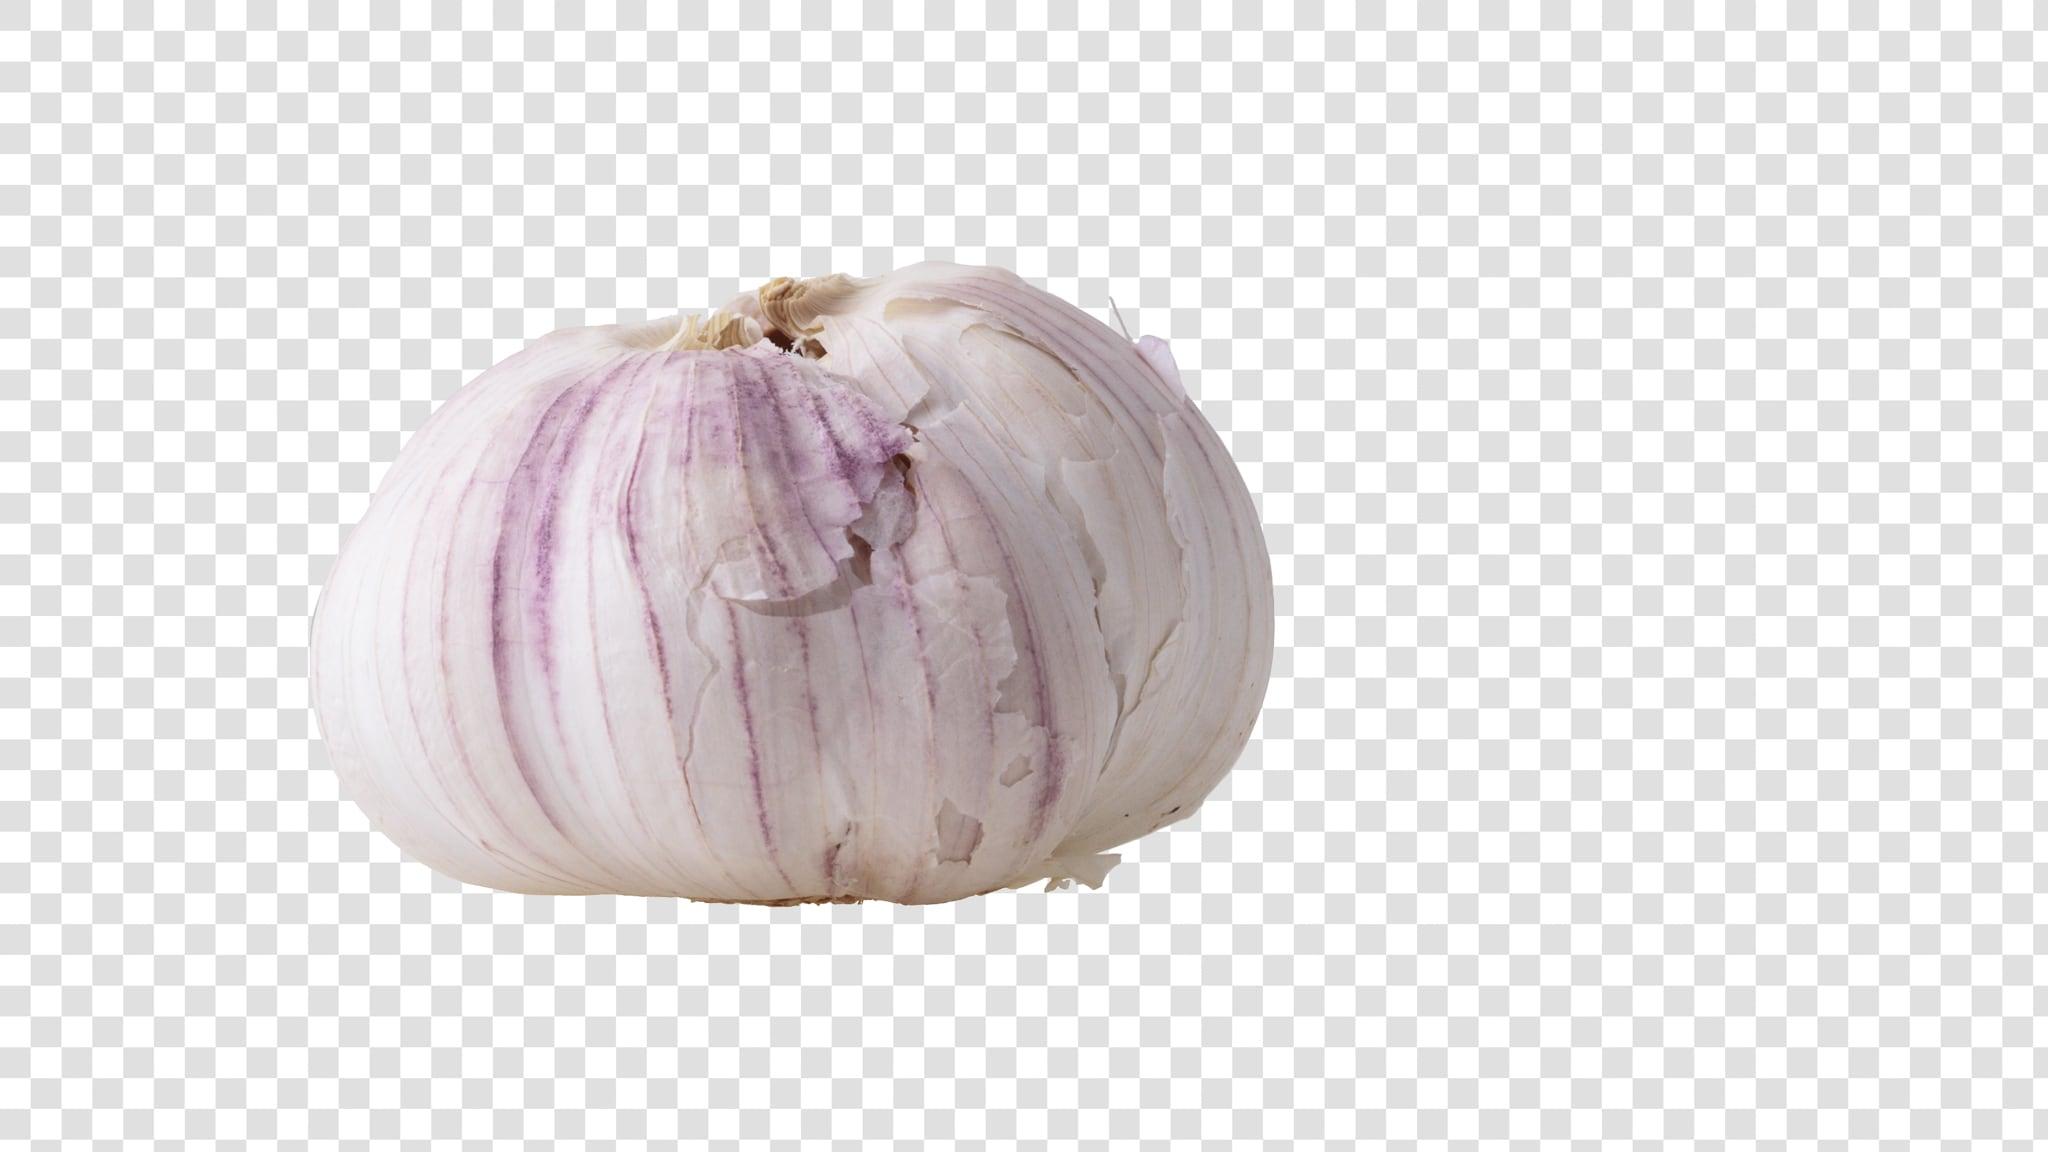 Garlic image asset with transparent background